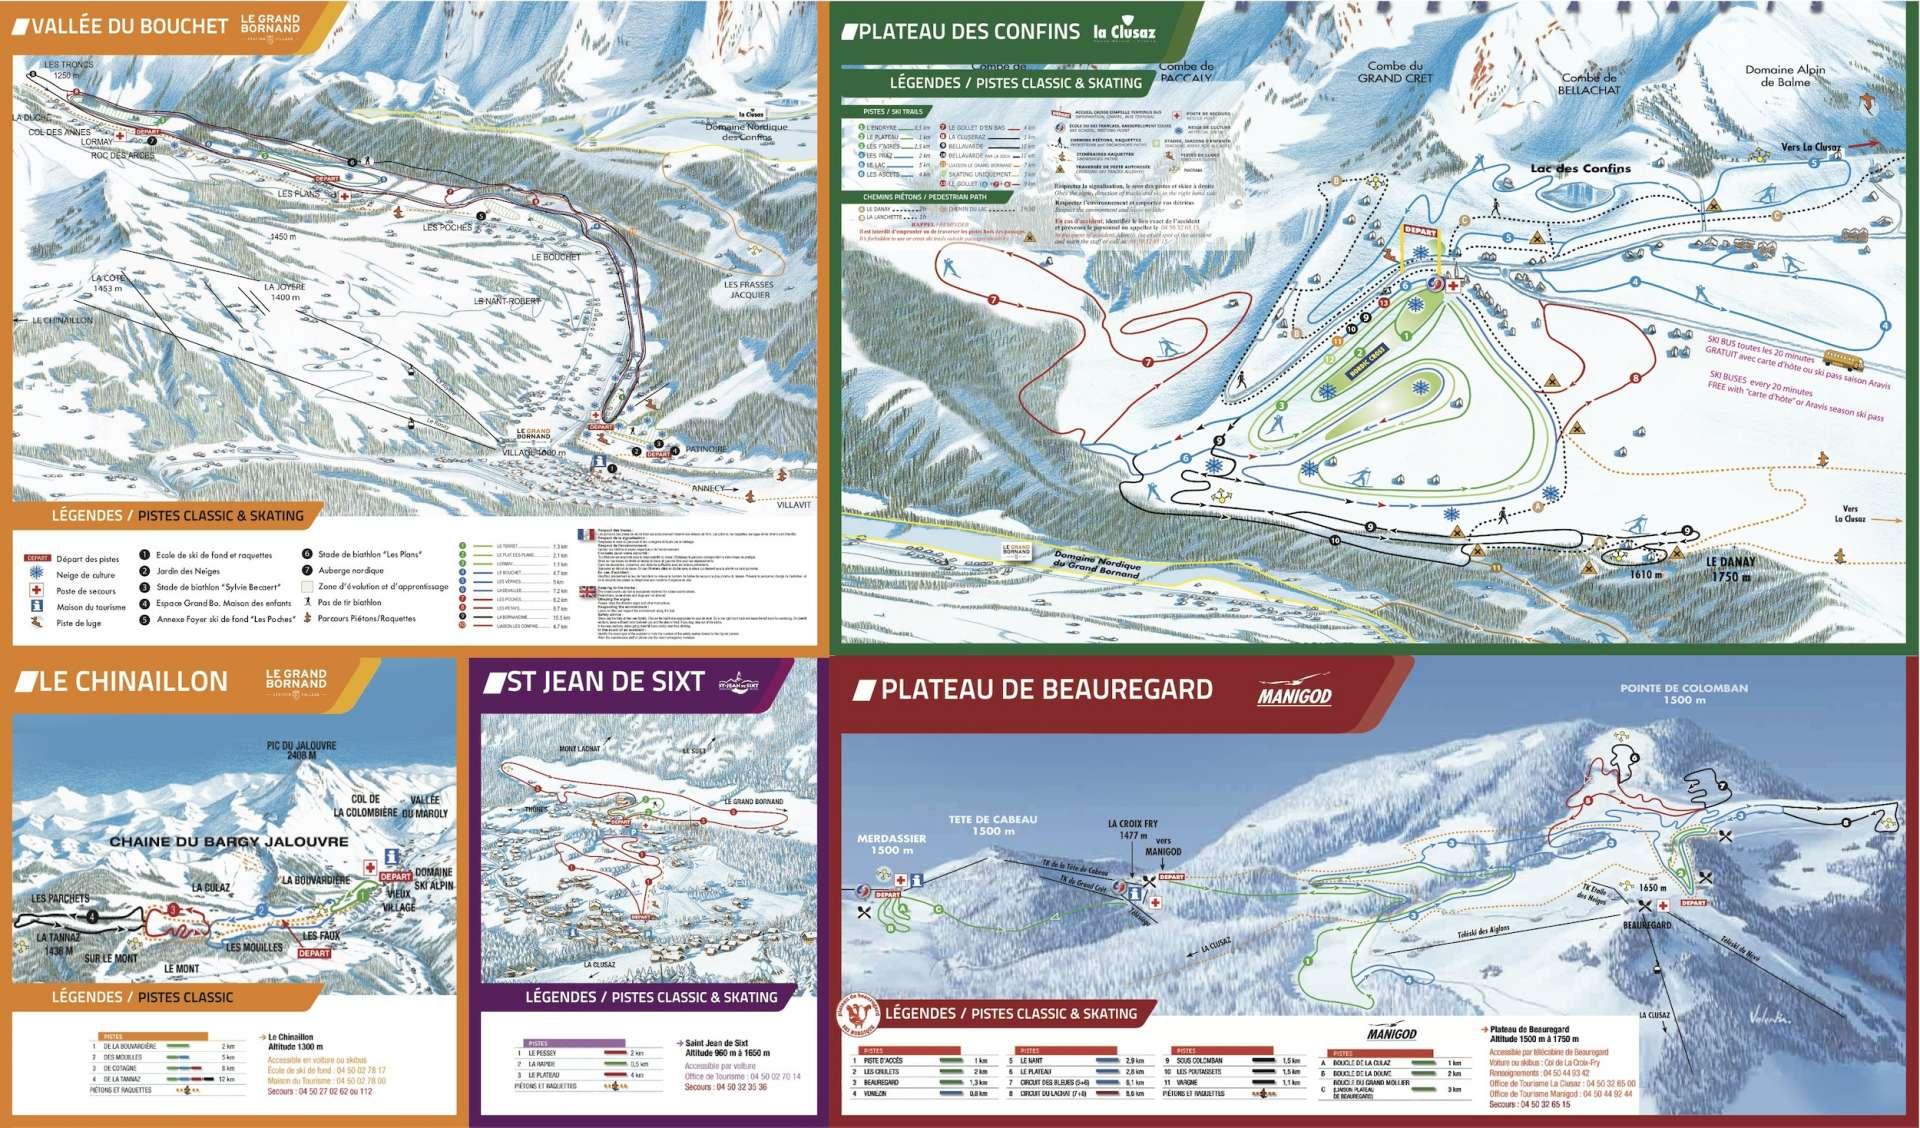 plan-pistes-ski-nordique-aravis-926-1359